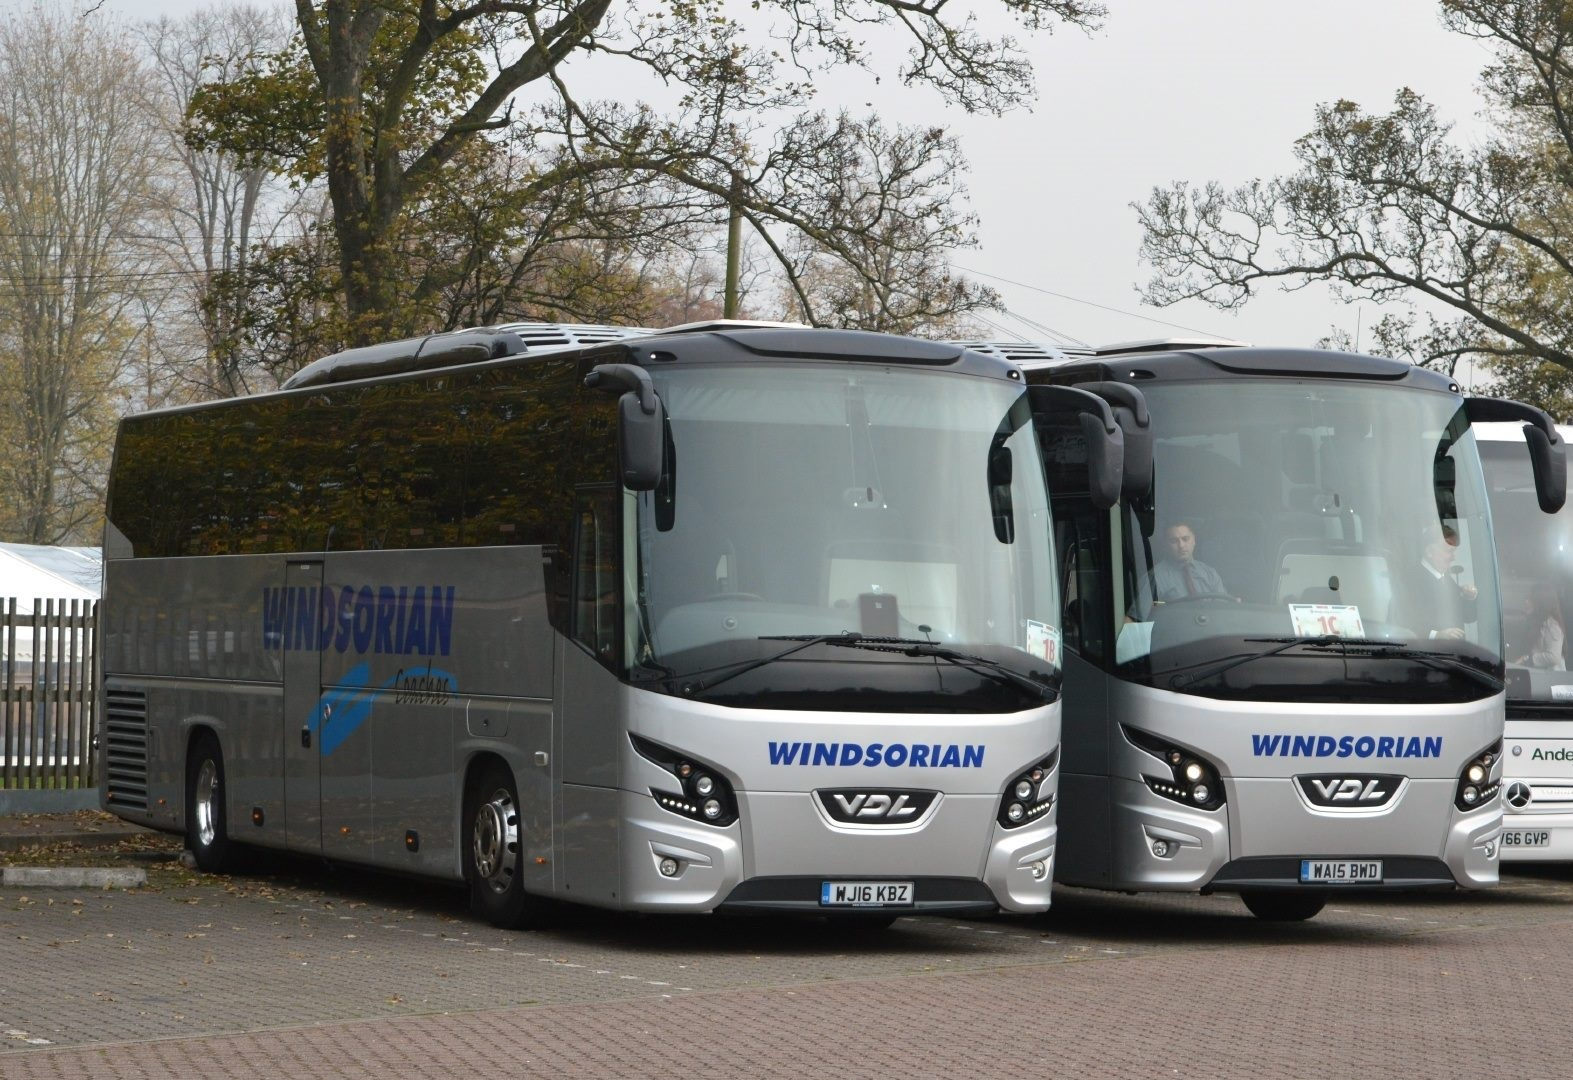 Windsor-03-11-2017--London-Mini-Coaches-VDL-FHD2